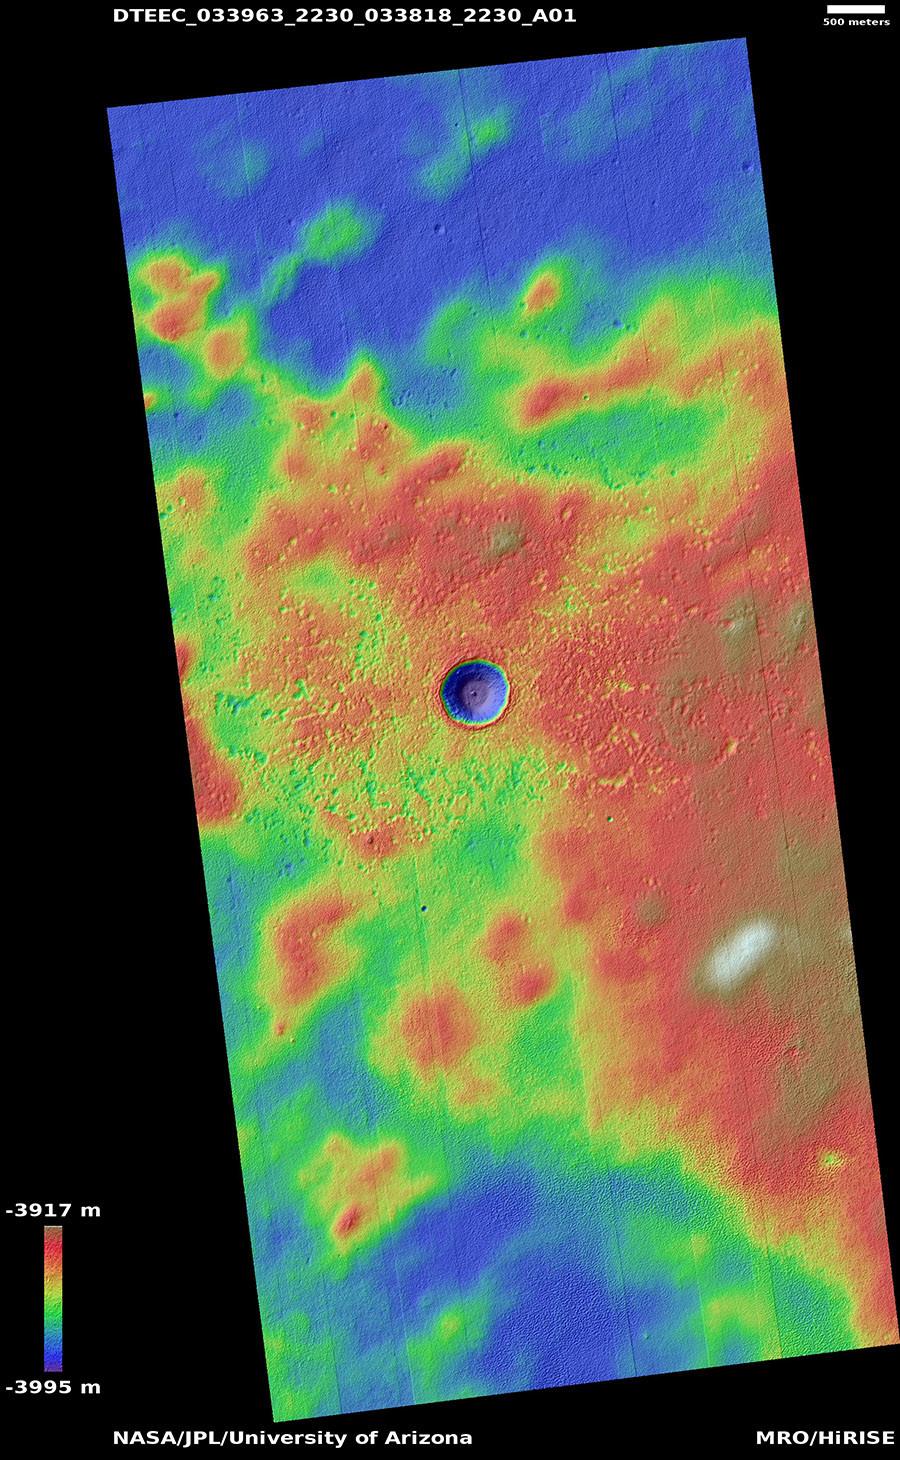 NASA / JPL / University of Arizona